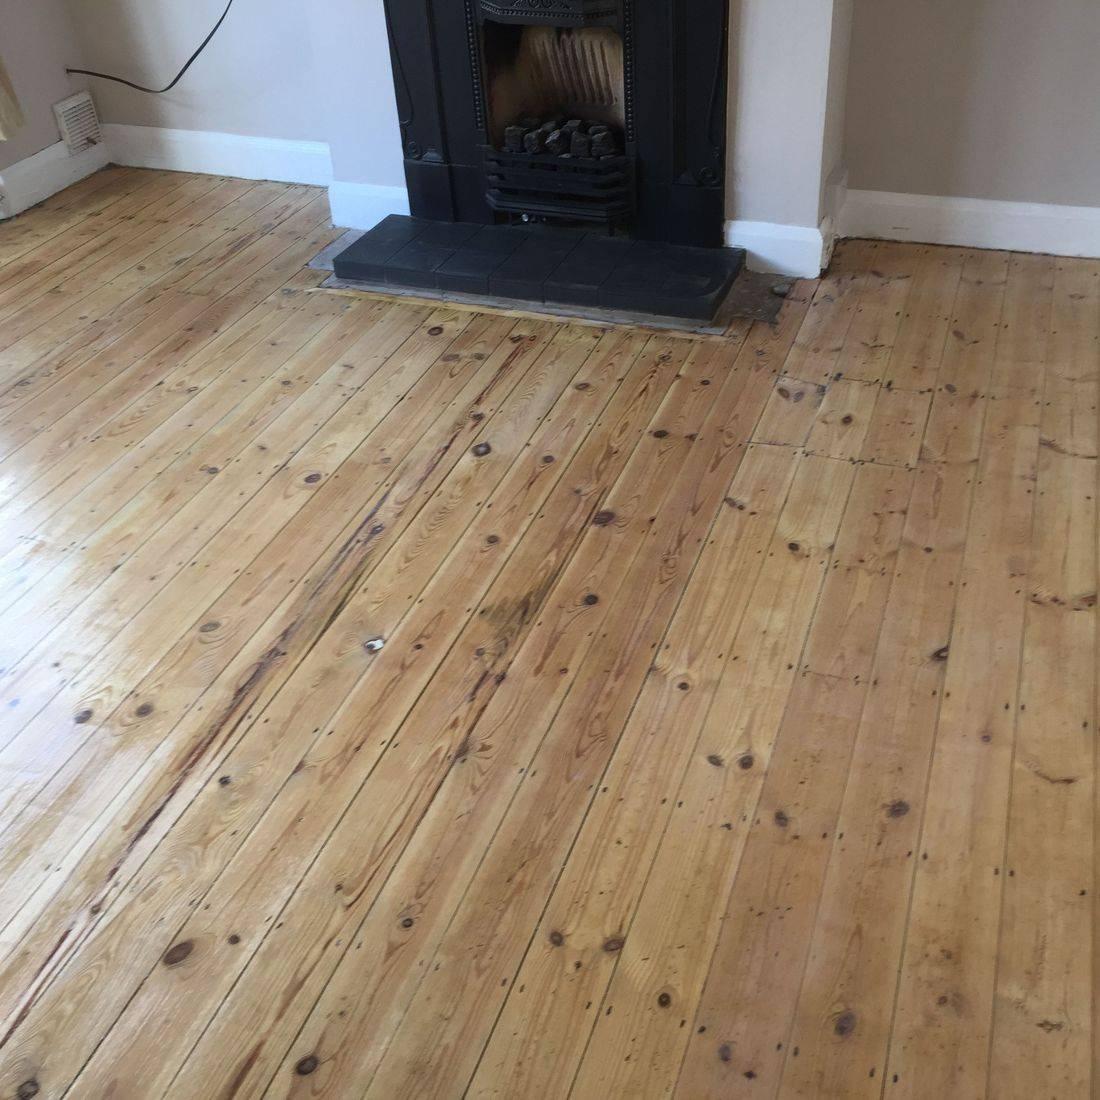 Floor sanding restoration Business Opportunity for sale